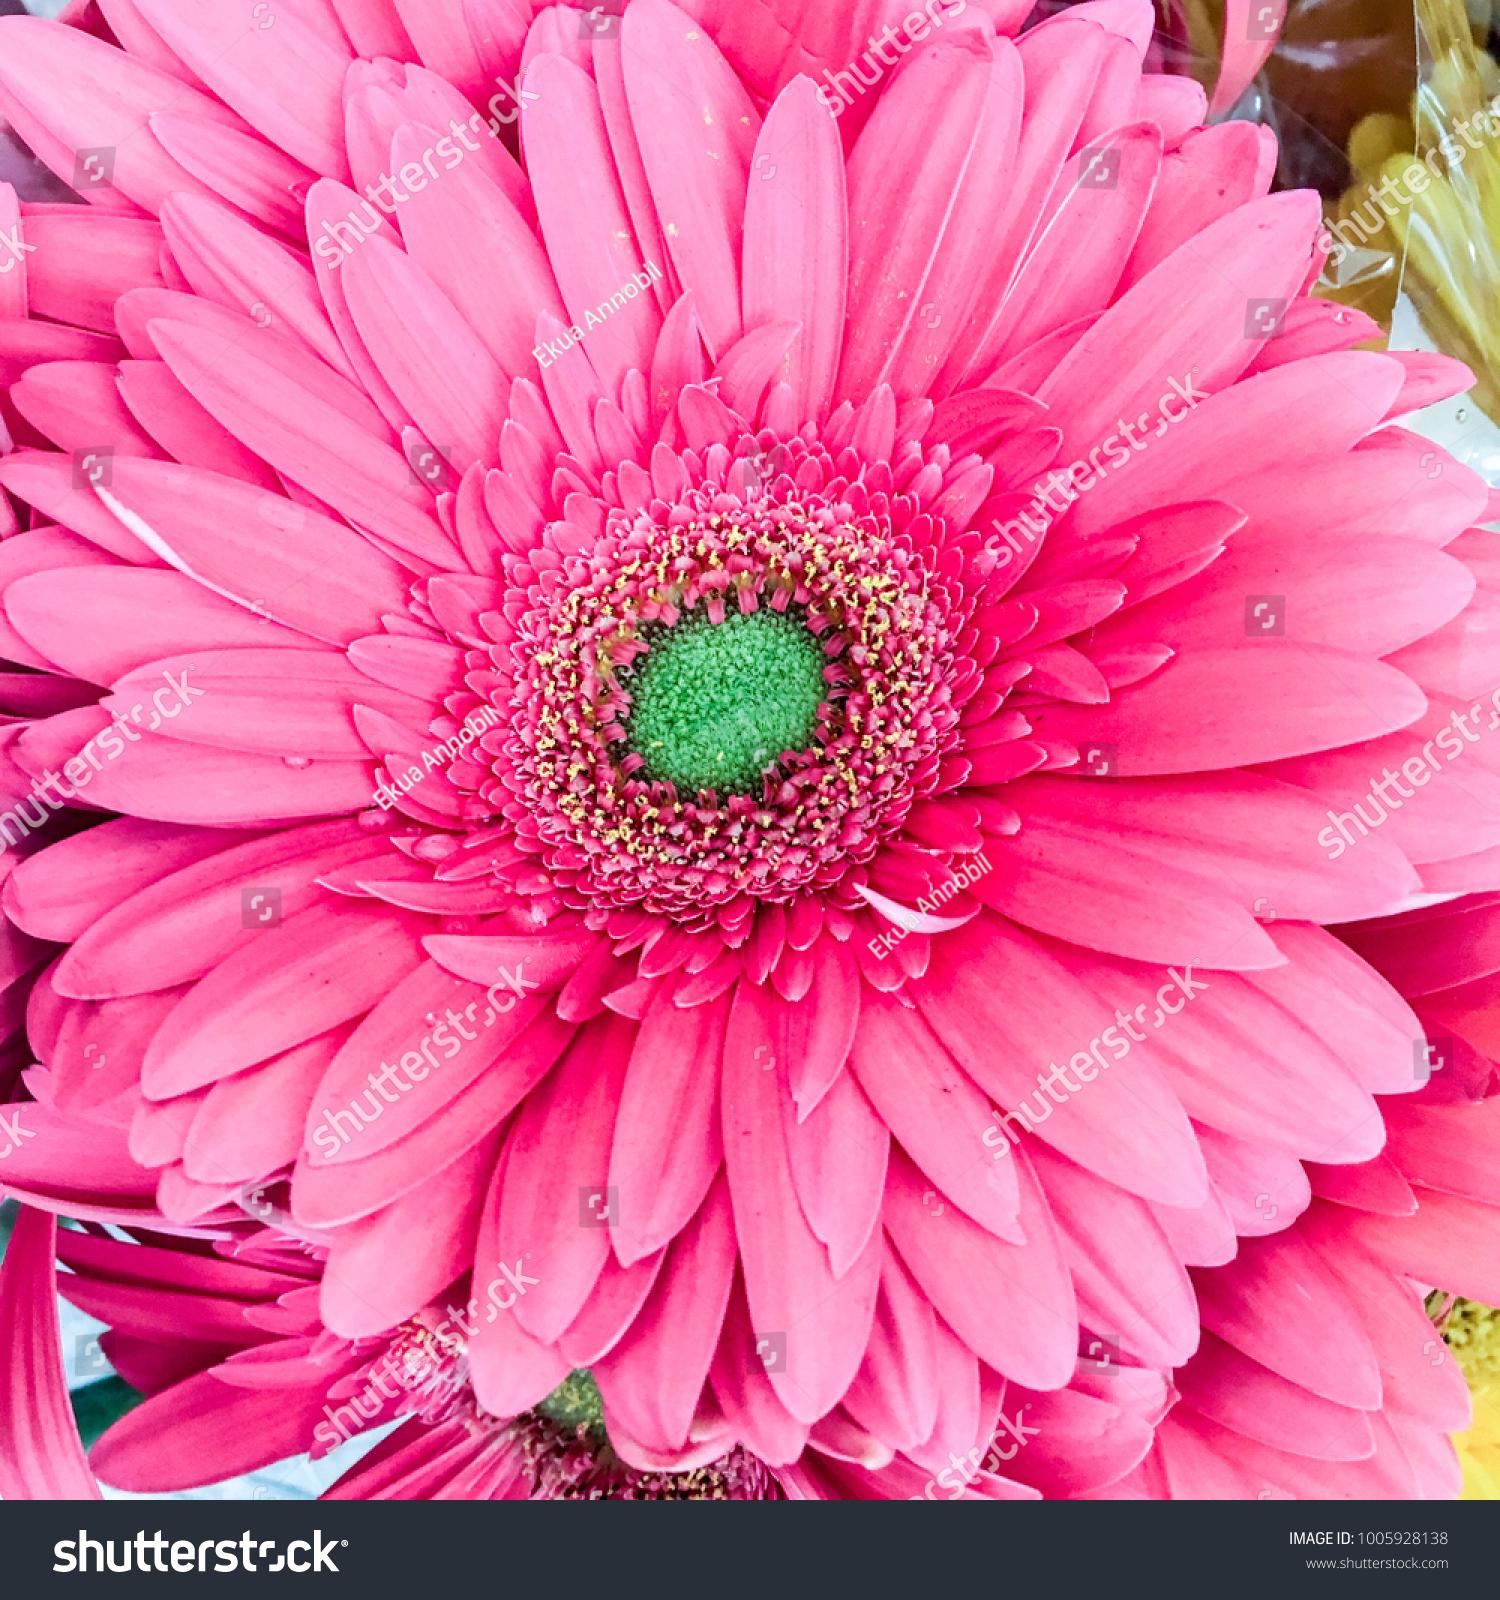 Pink Gerbera Flower With Vivid Green Centre Ez Canvas